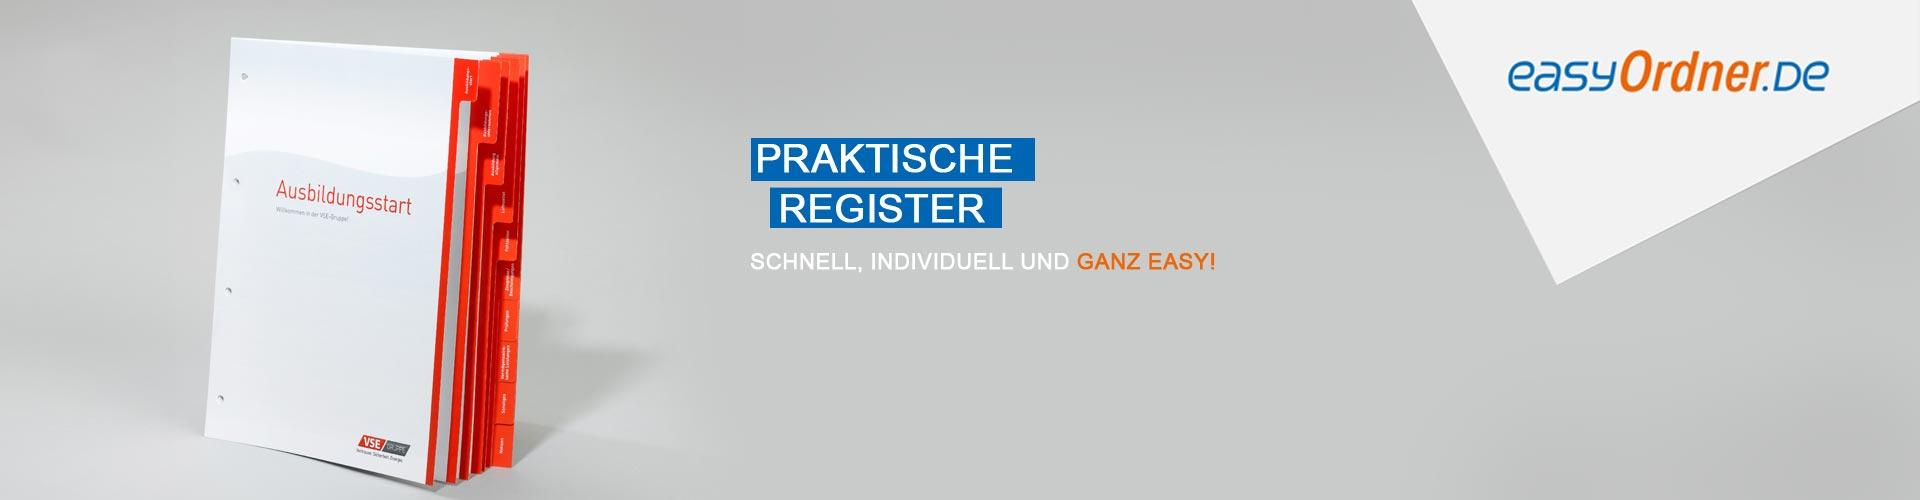 Register, individuelle Register bedrucken, Trennblätter, Ordnerregister